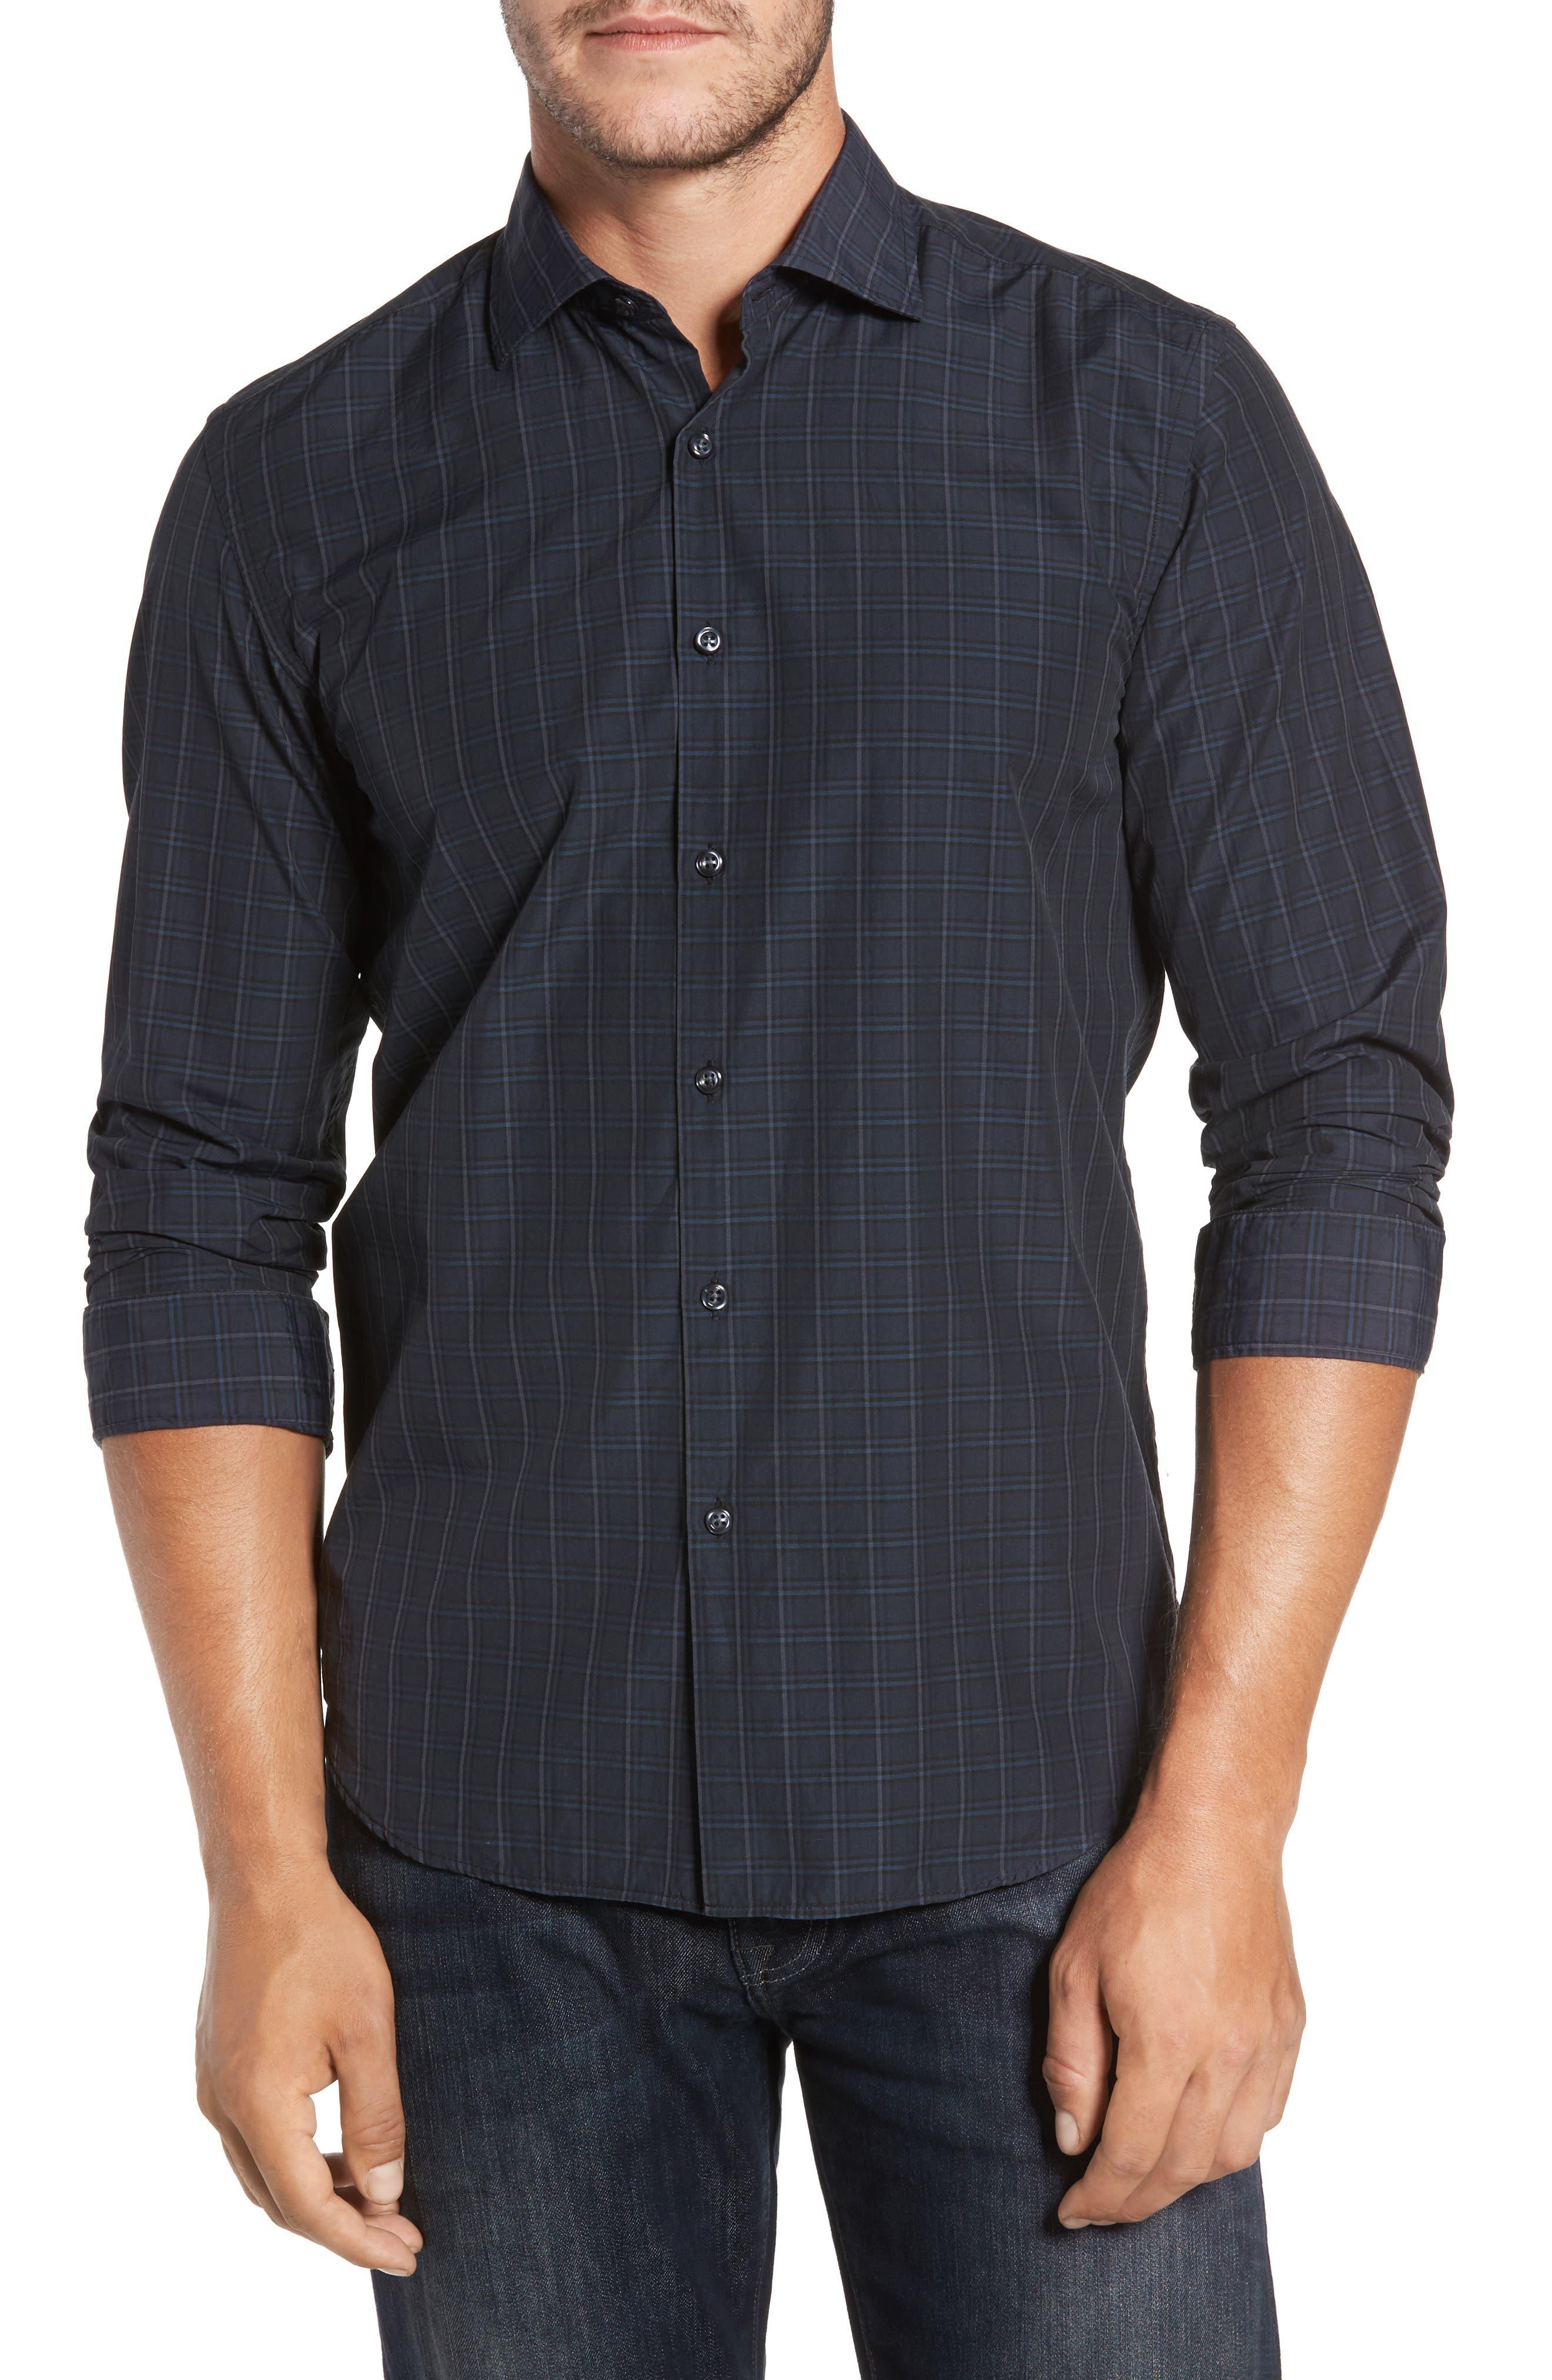 Alternate Image 1 Selected - Robert Barakett Charleston Regular Fit Plaid Sport Shirt